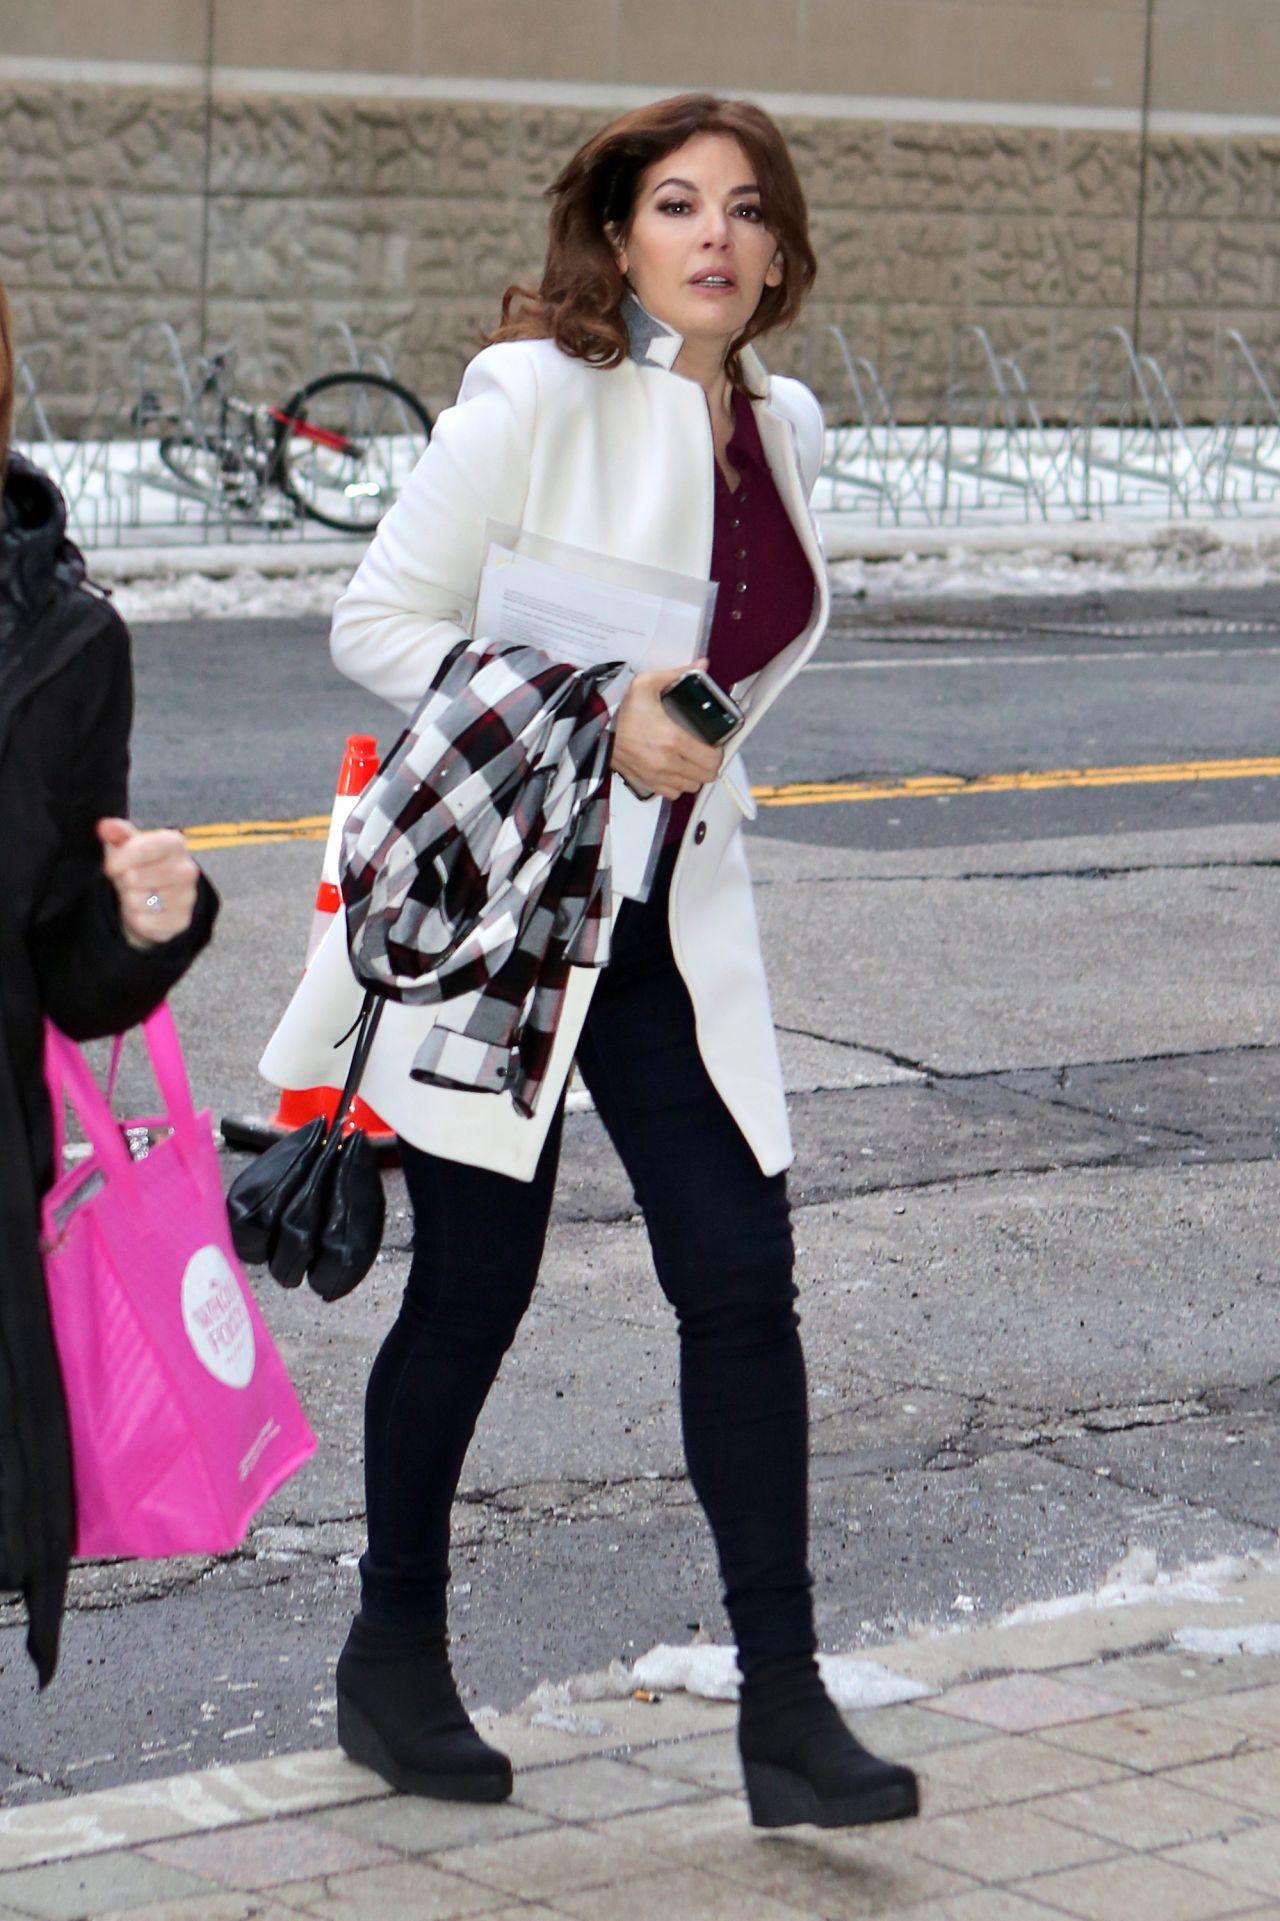 Nigella Lawson Arrives At Cbc Building In Toronto 04 17 2018